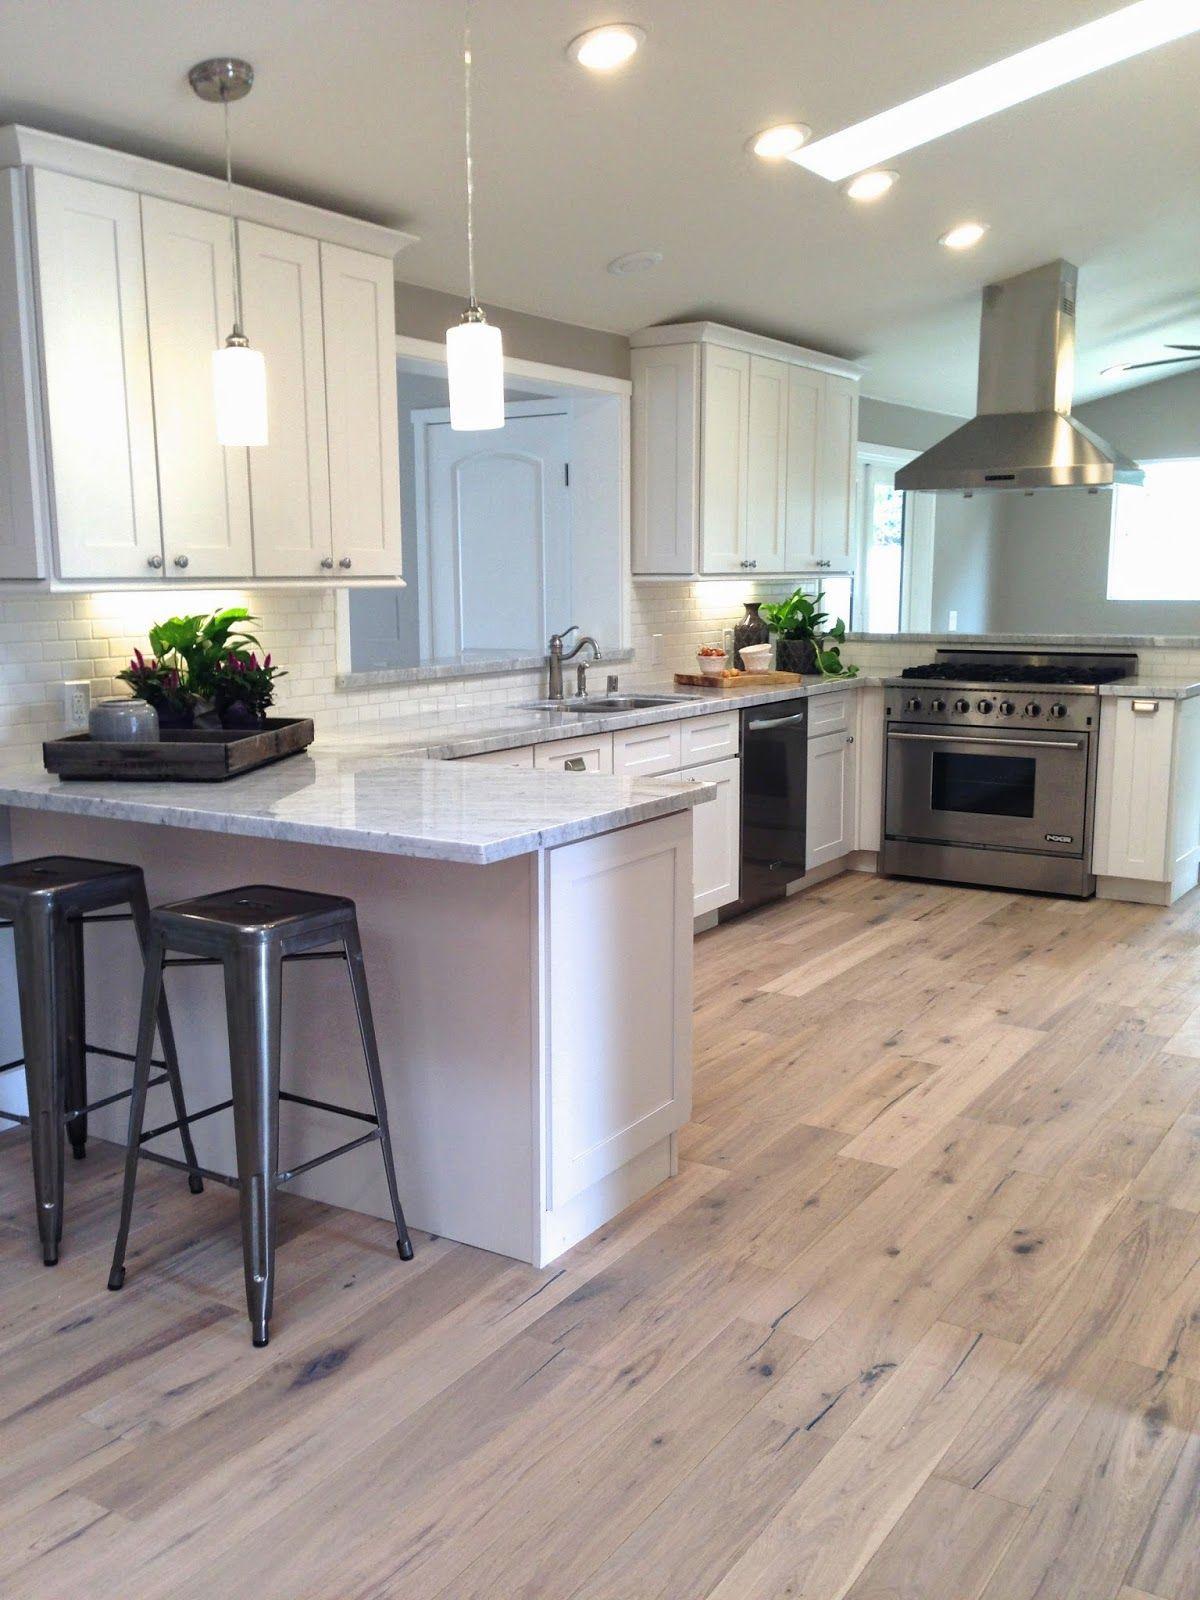 hardwood floors in kitchen i like the stain color of the floorsu2026 TSTFKVI